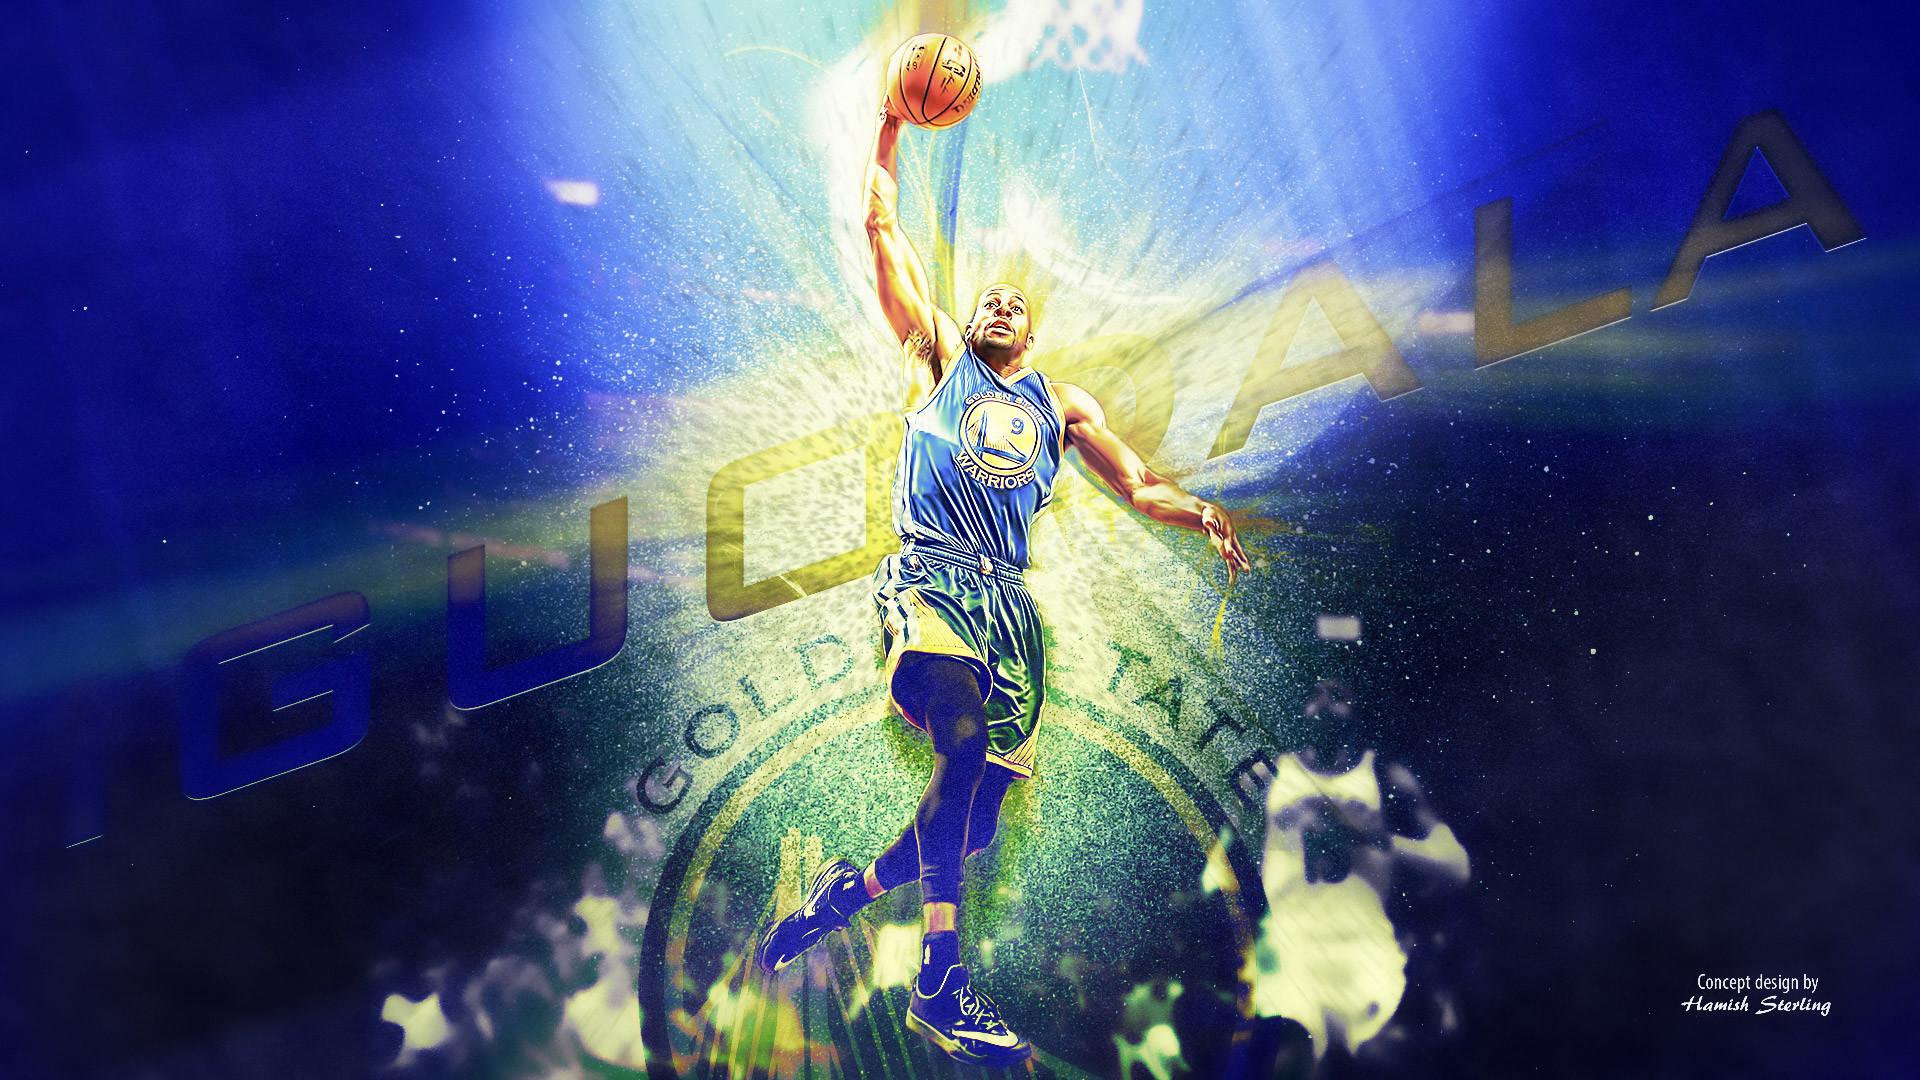 Andre Iguodala 2016 NBA Finals Wallpaper